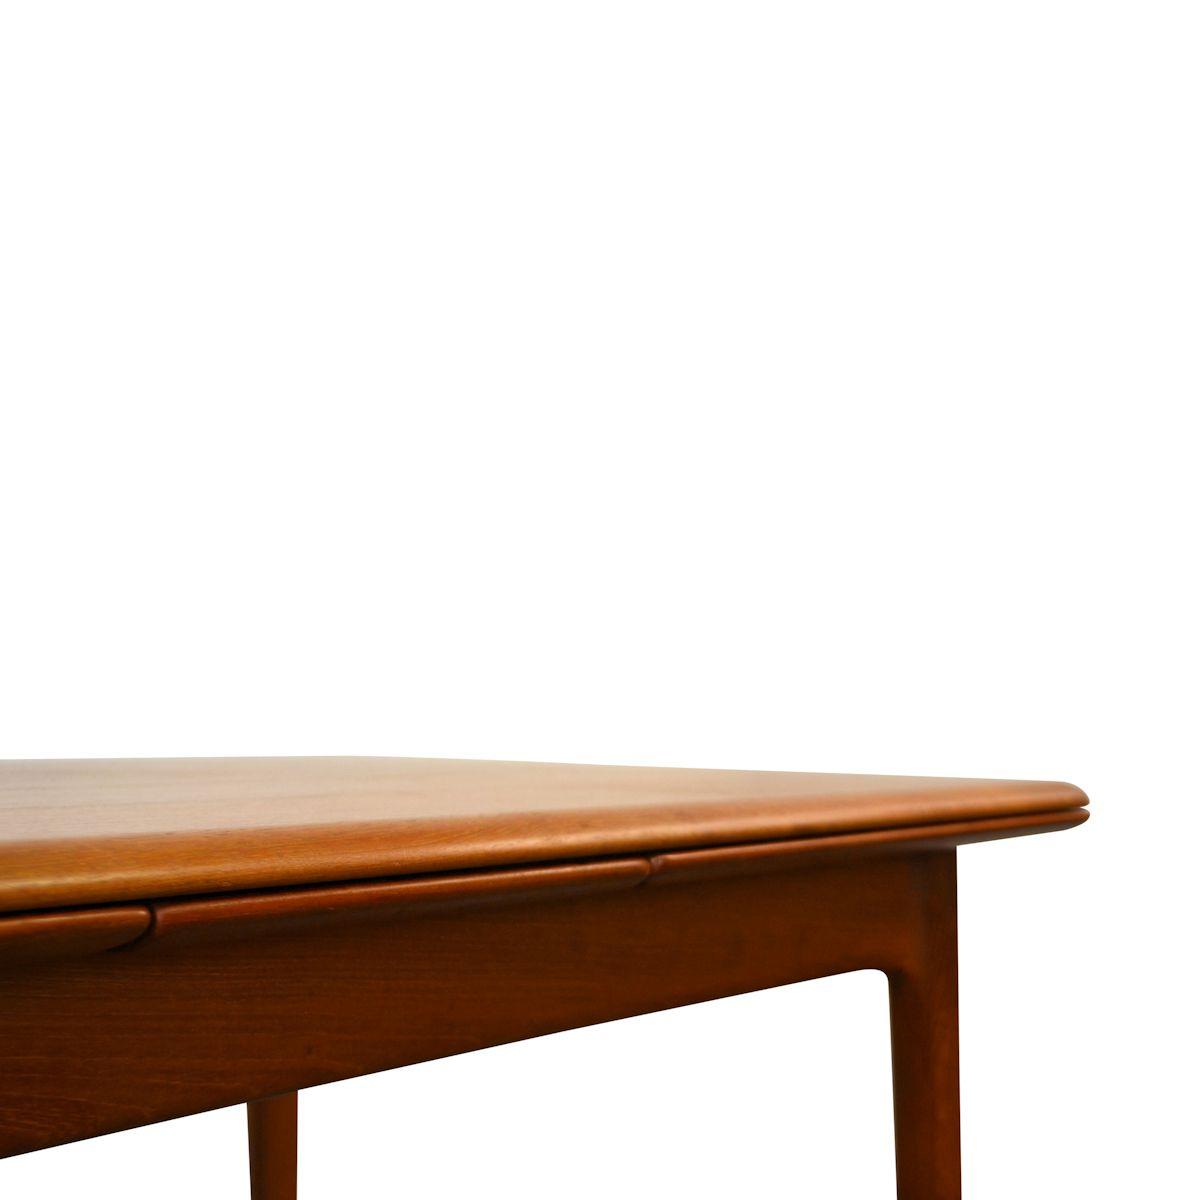 Vintage Danish Modern Svend Aage Madsen Dining Table - detail